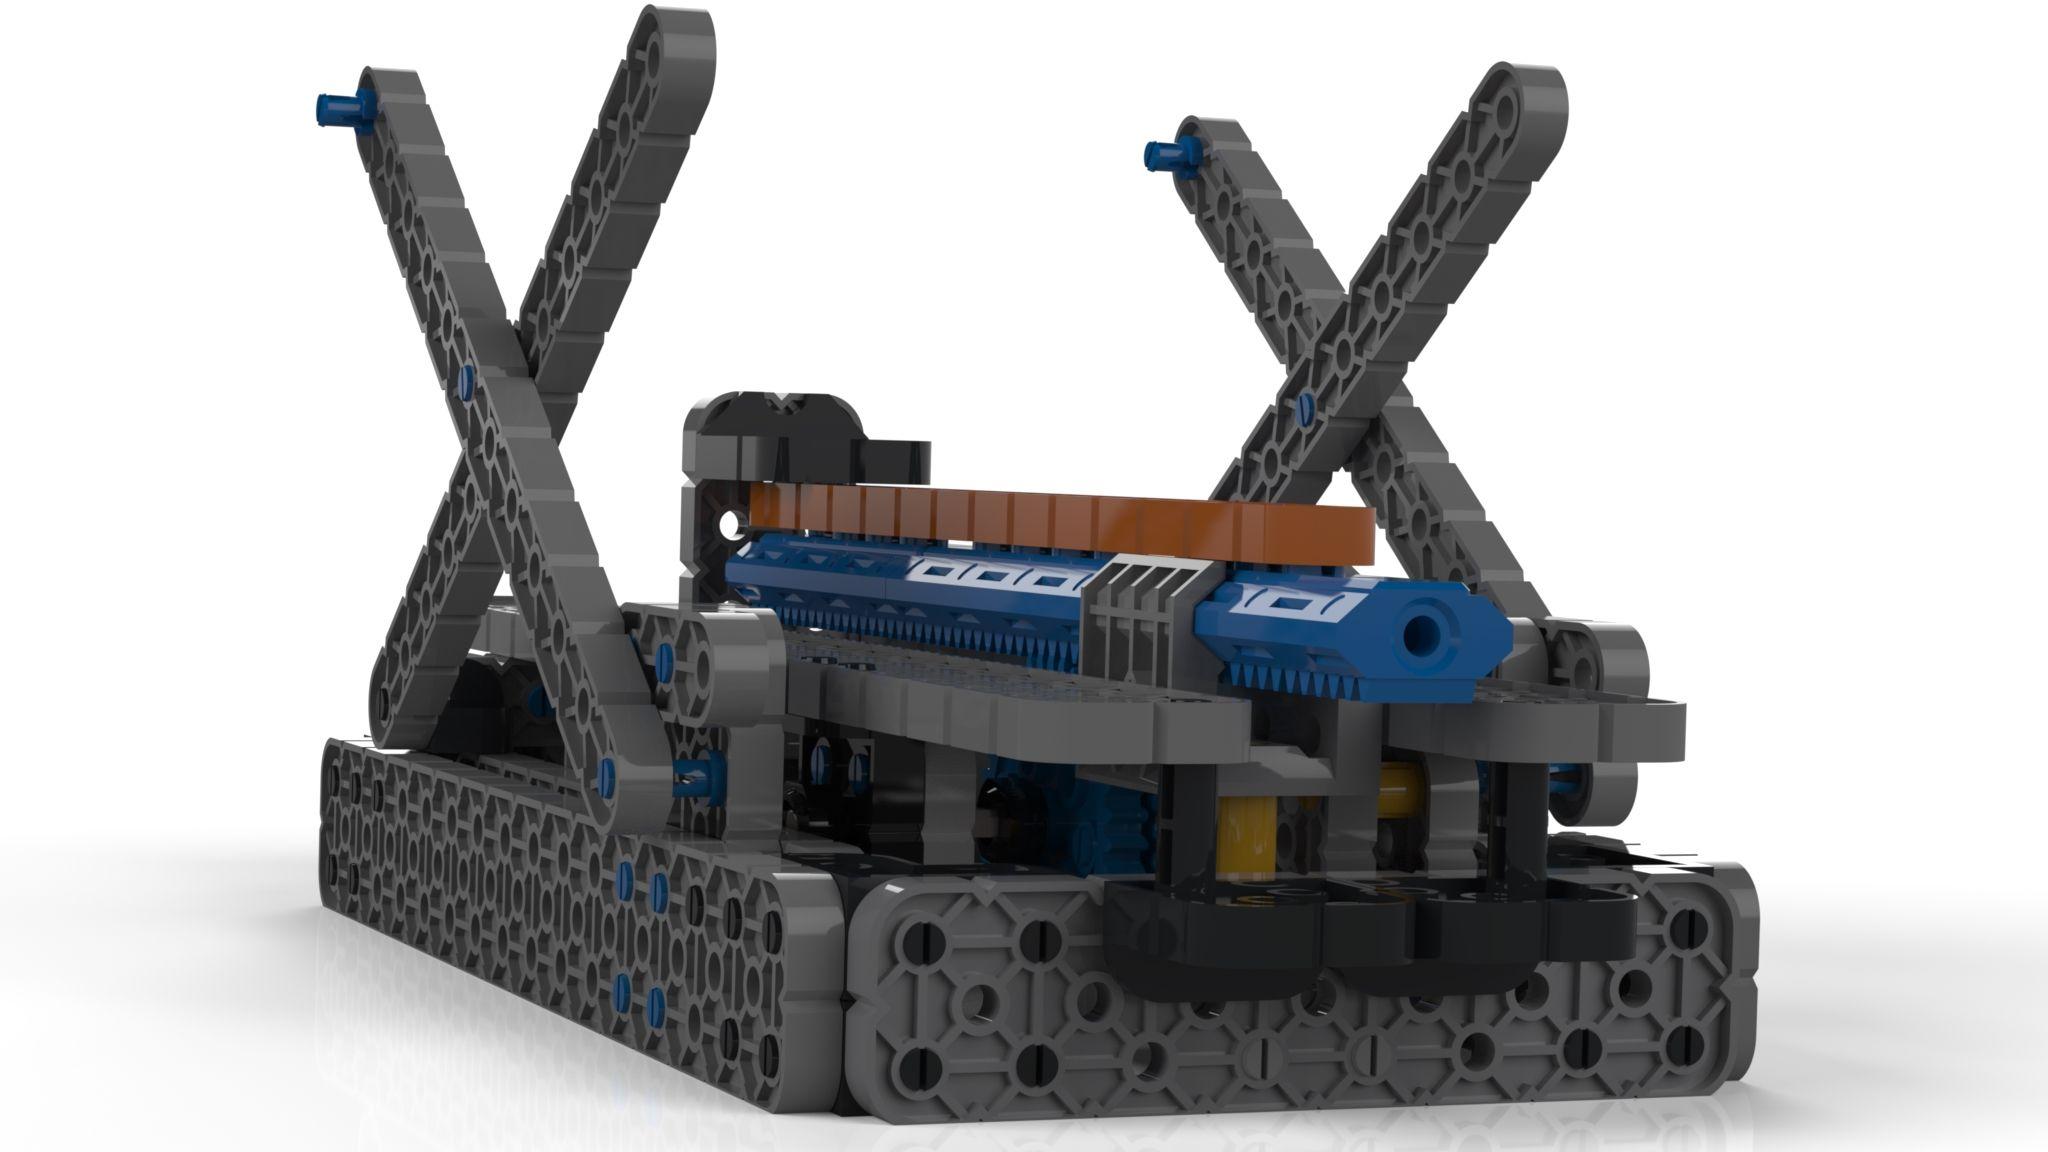 Vex-iq-elevation-mechanics-lcs---fabrica-de-nerdes-03-3500-3500